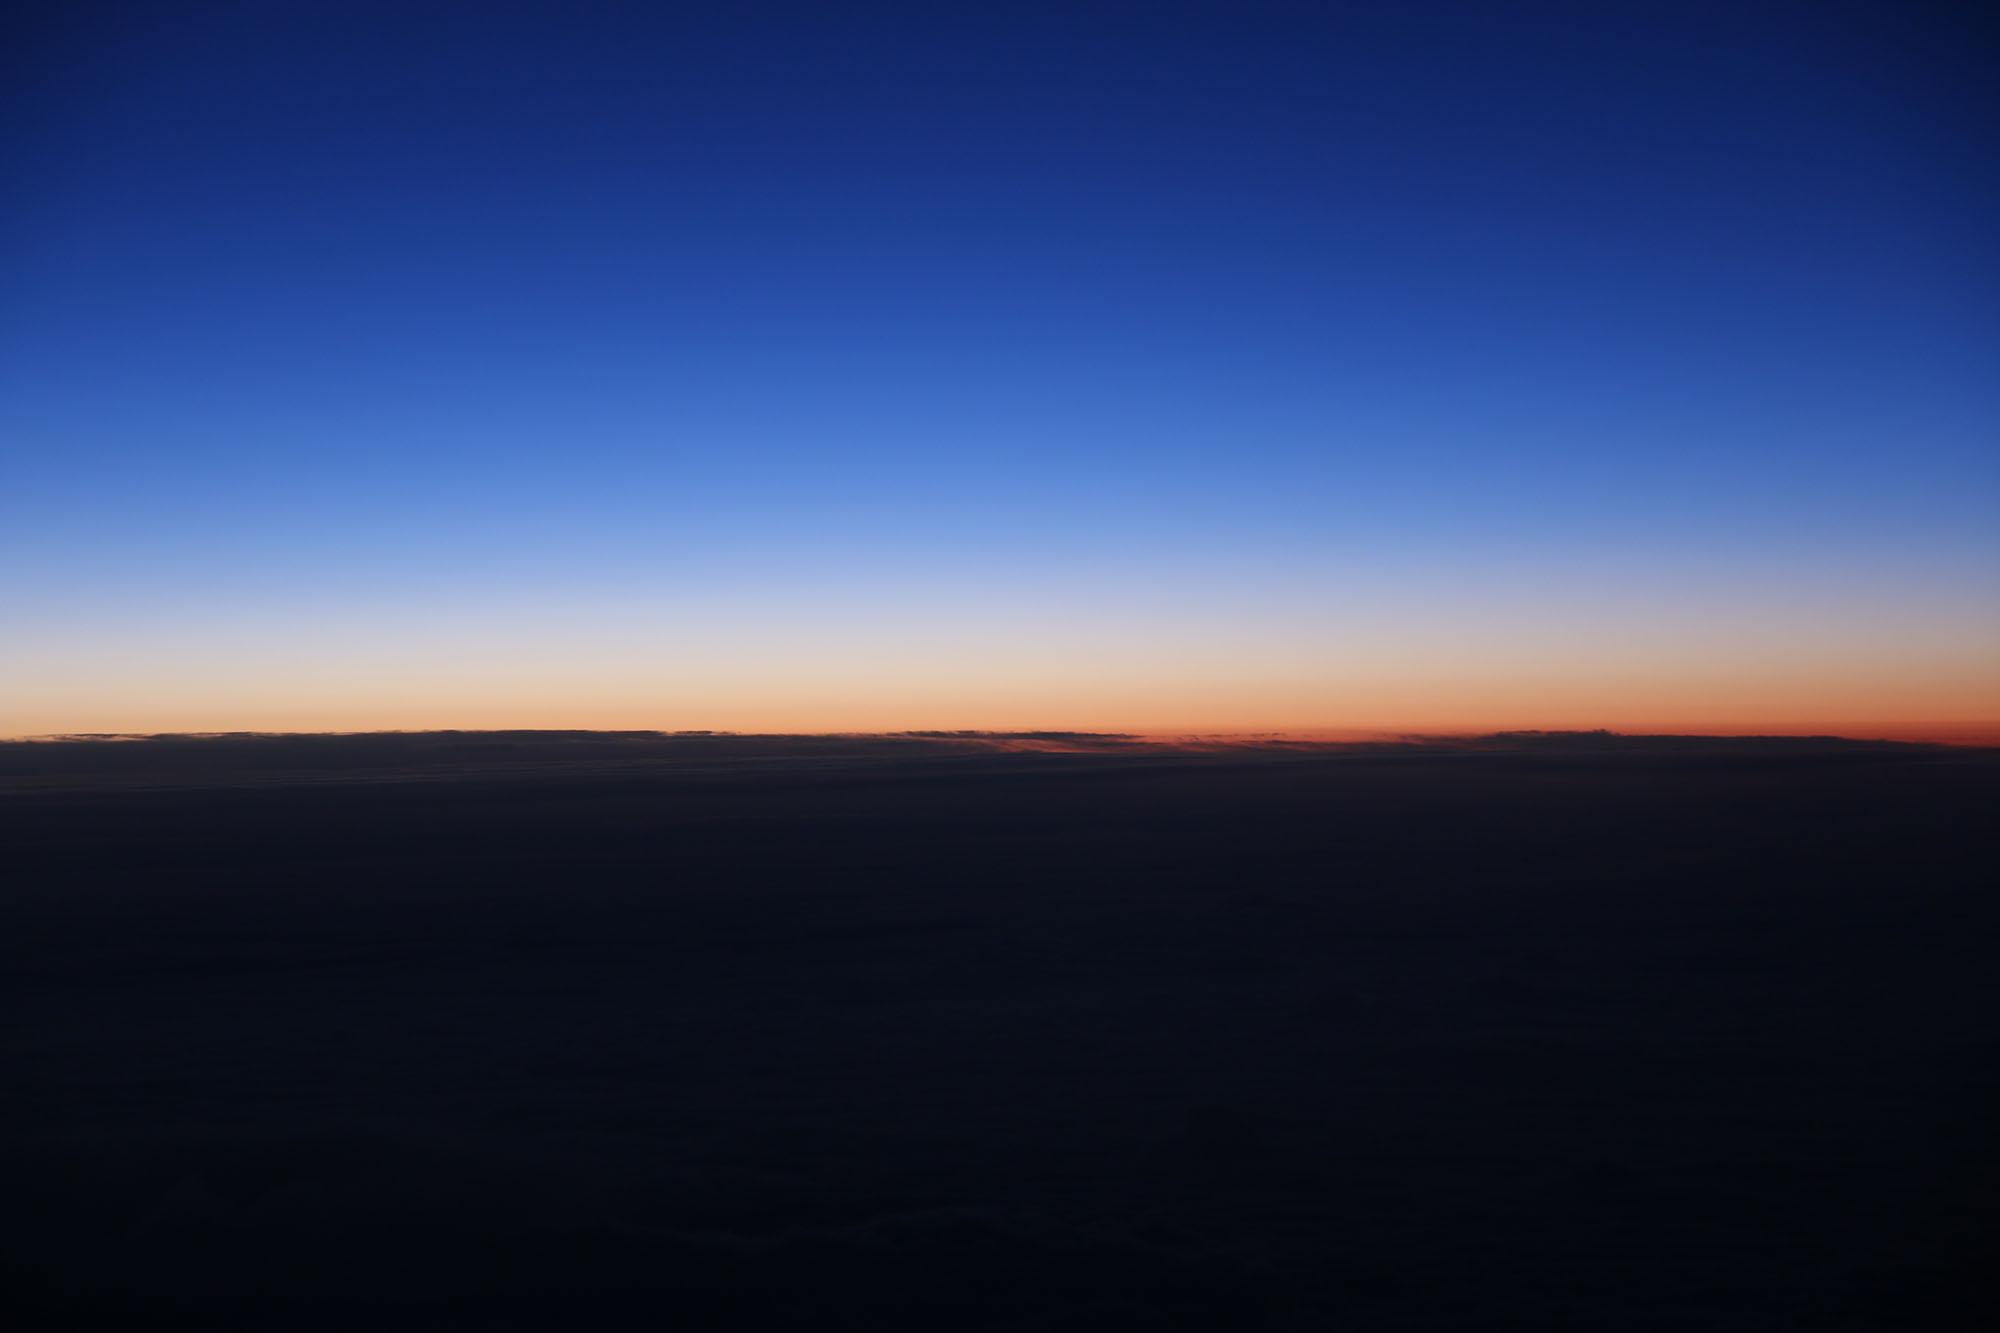 img_7281-soluppgang-flyg